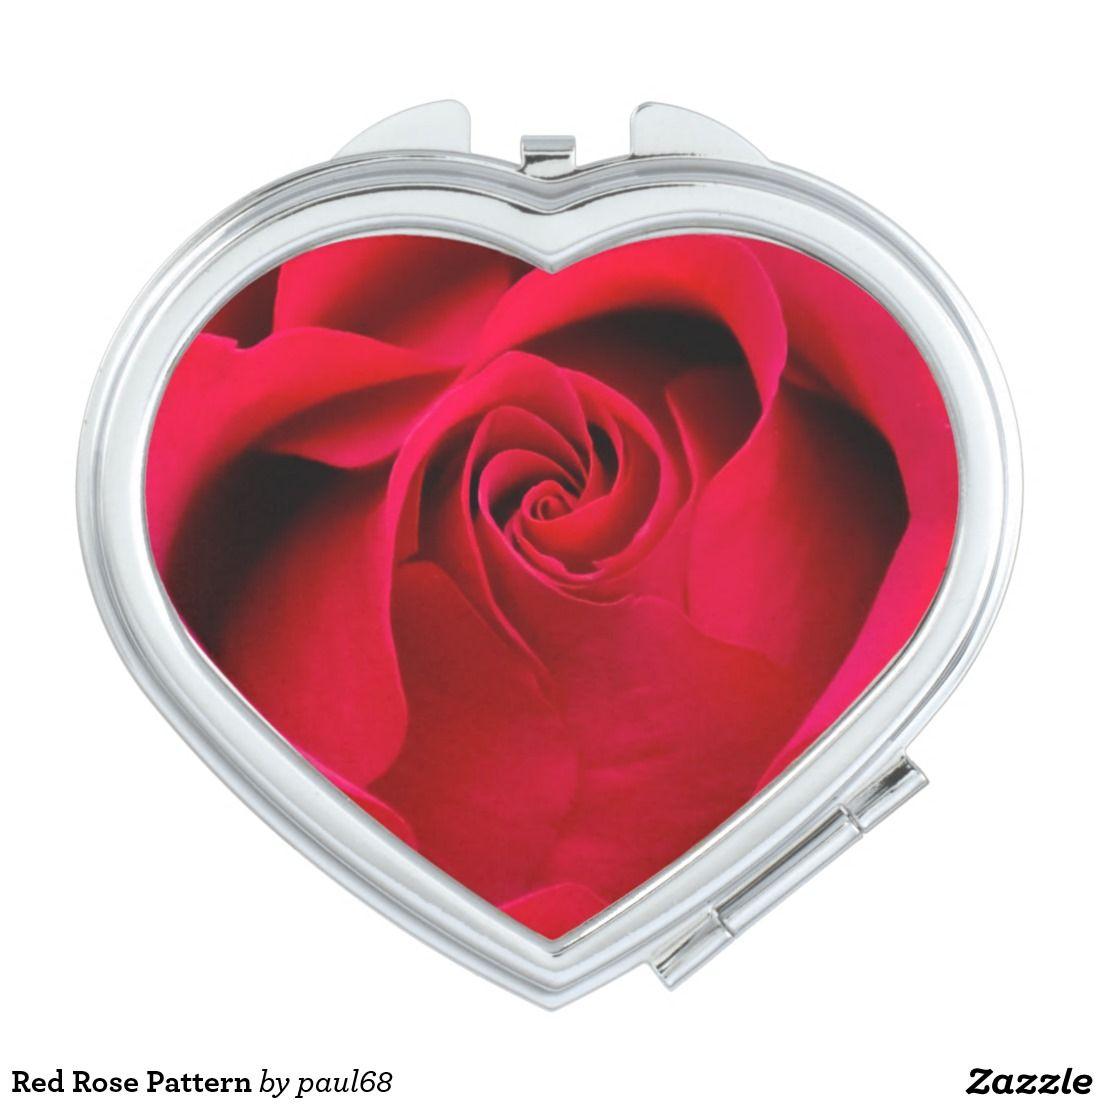 Red Rose Pattern Vanity Mirrors